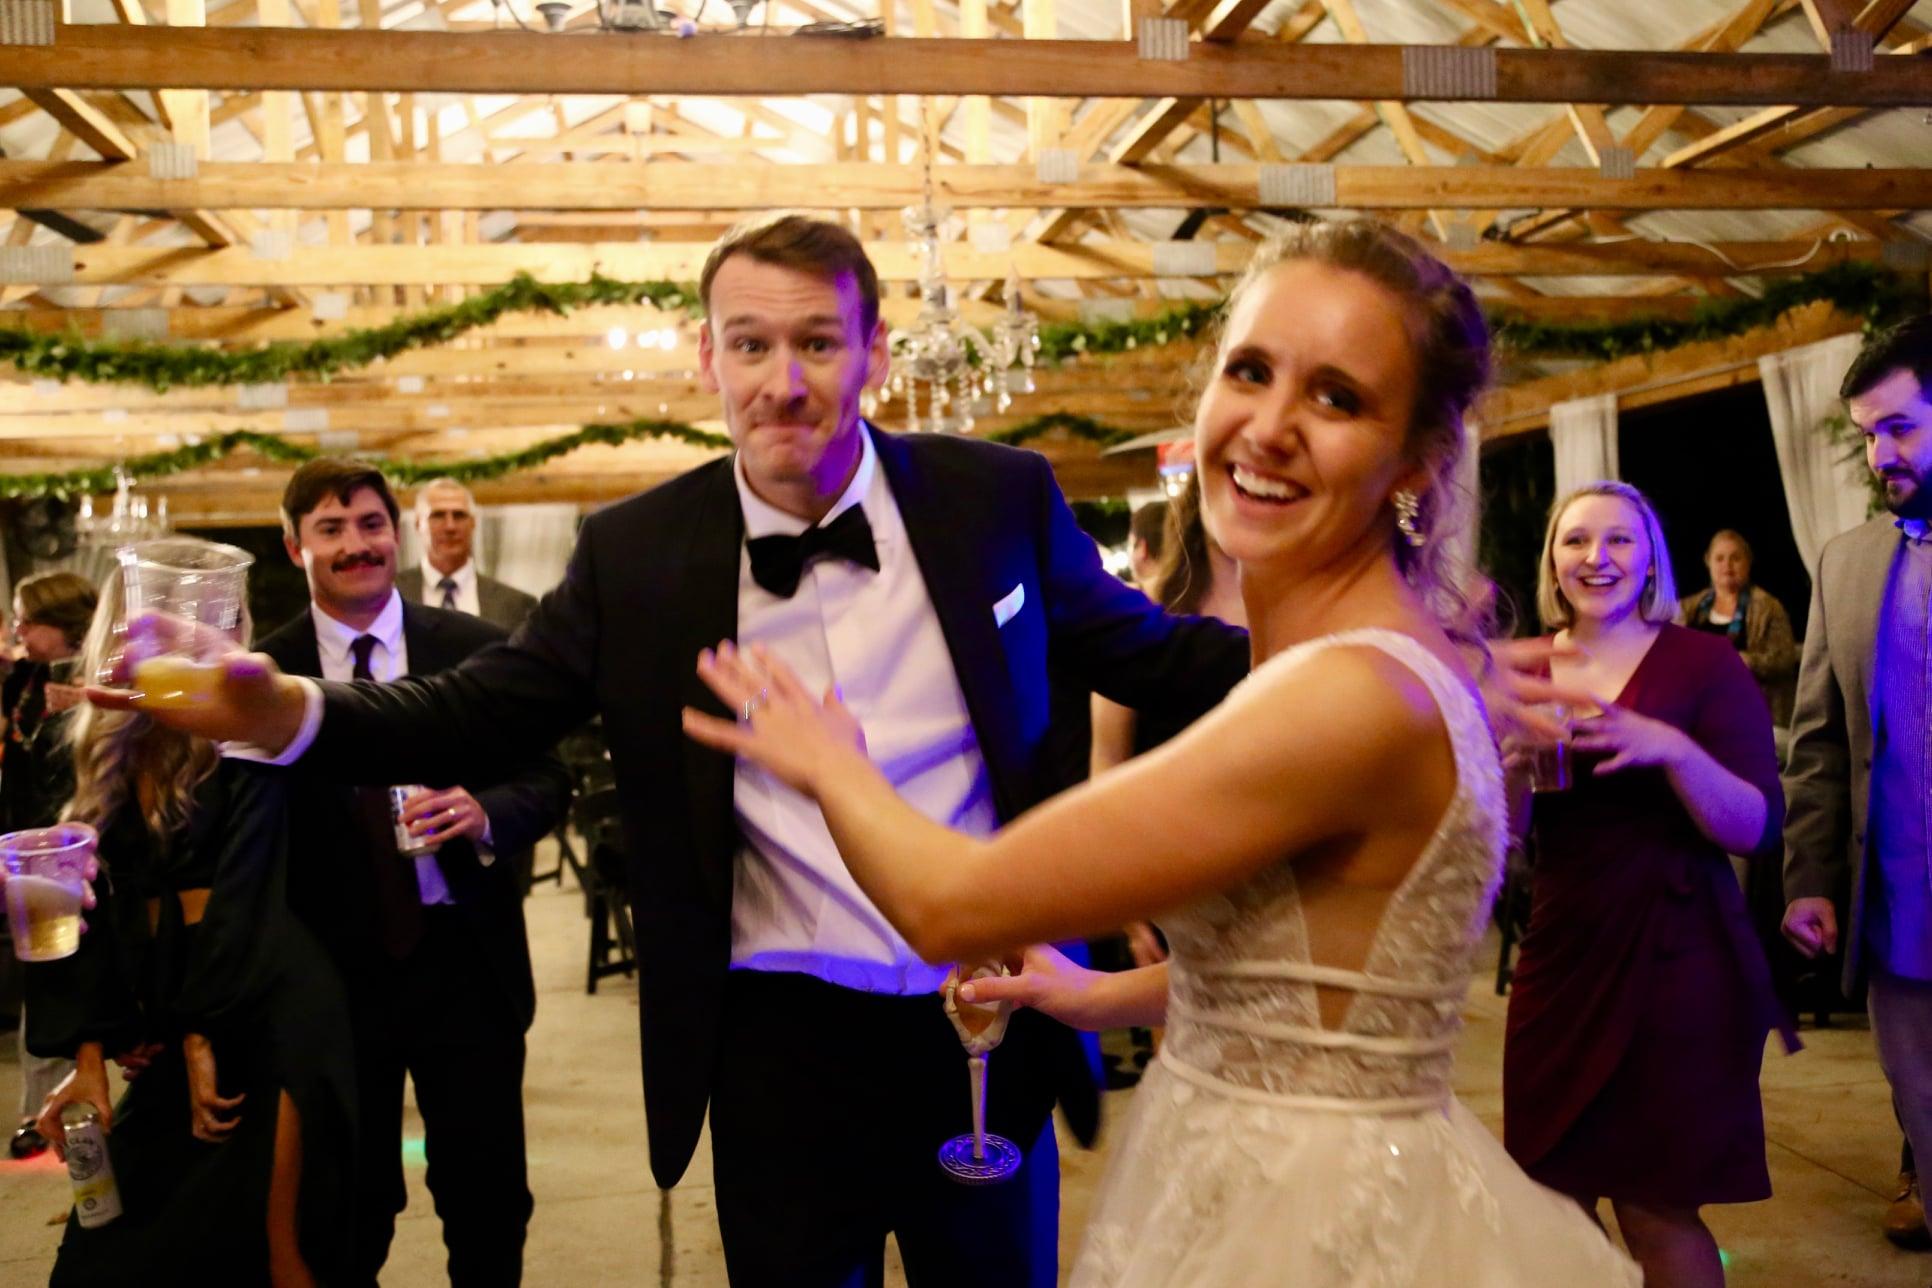 princess bride reception dress in downtown Raleigh farm wedding venue